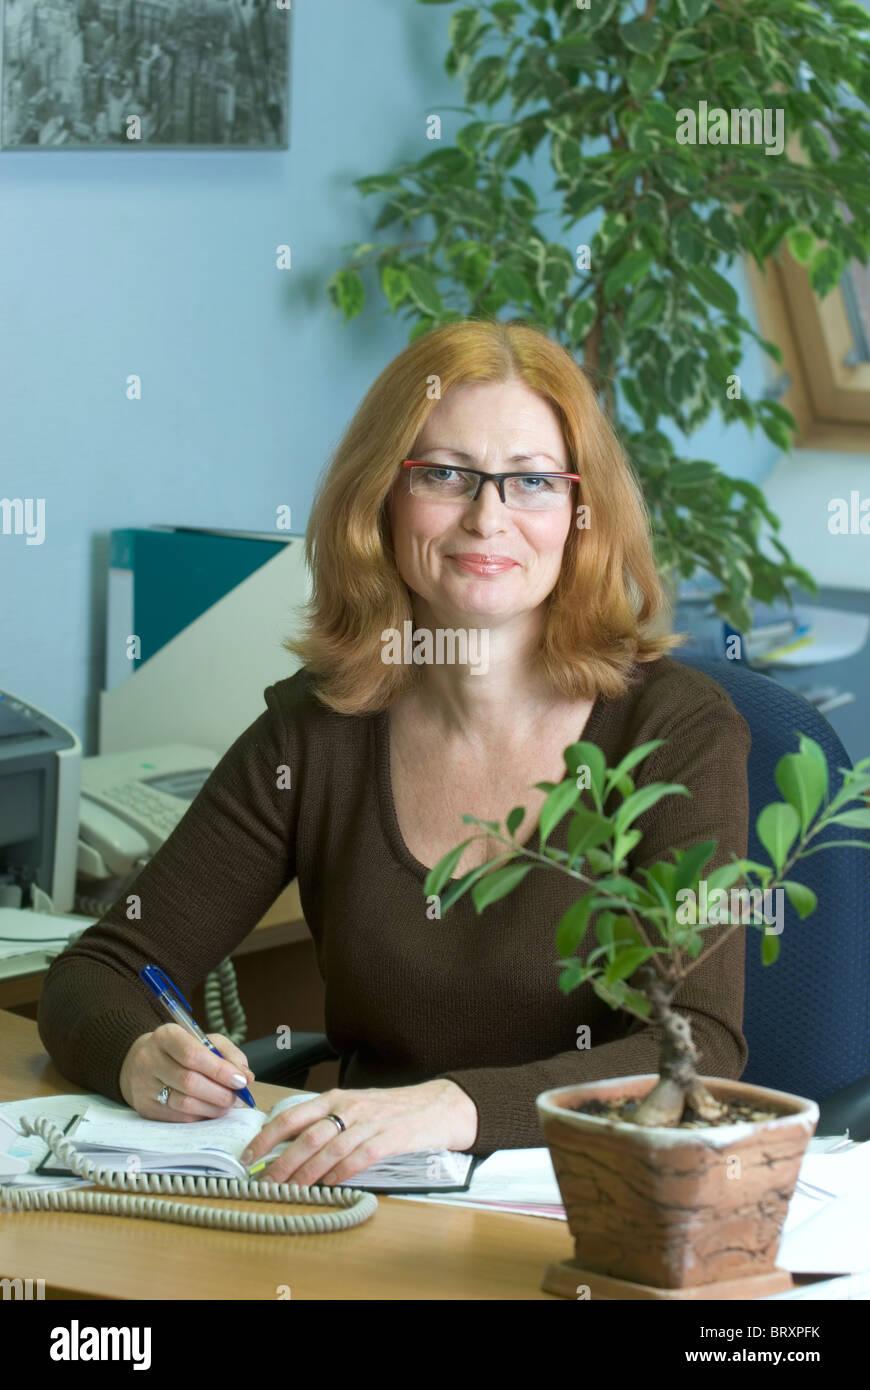 portrait of mature secretary at desk stock photo: 31935895 - alamy